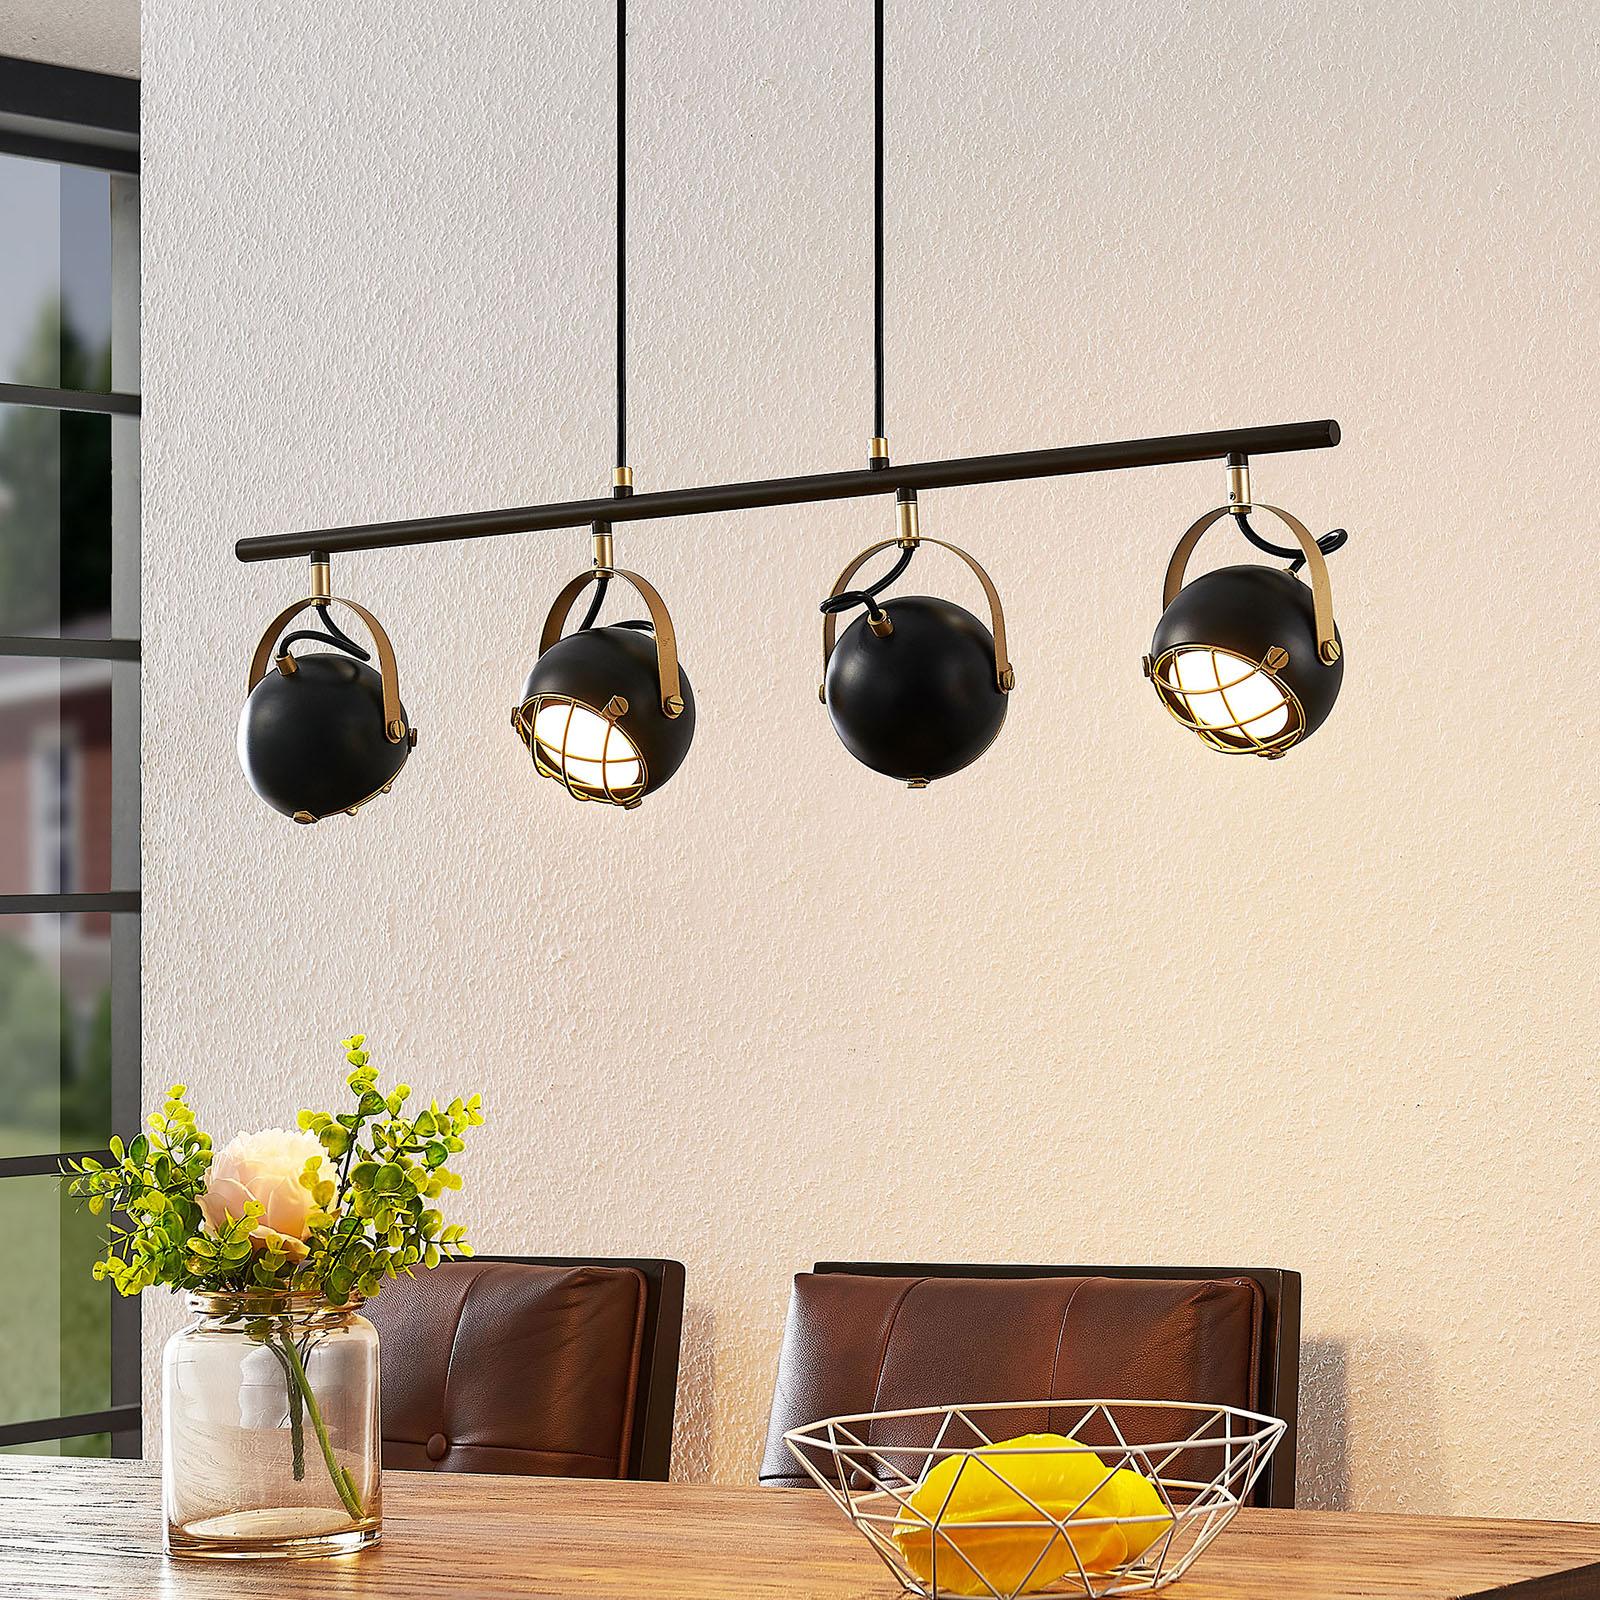 Lindby Dawid LED-hengelampe gulldekor, 4 lyskilder